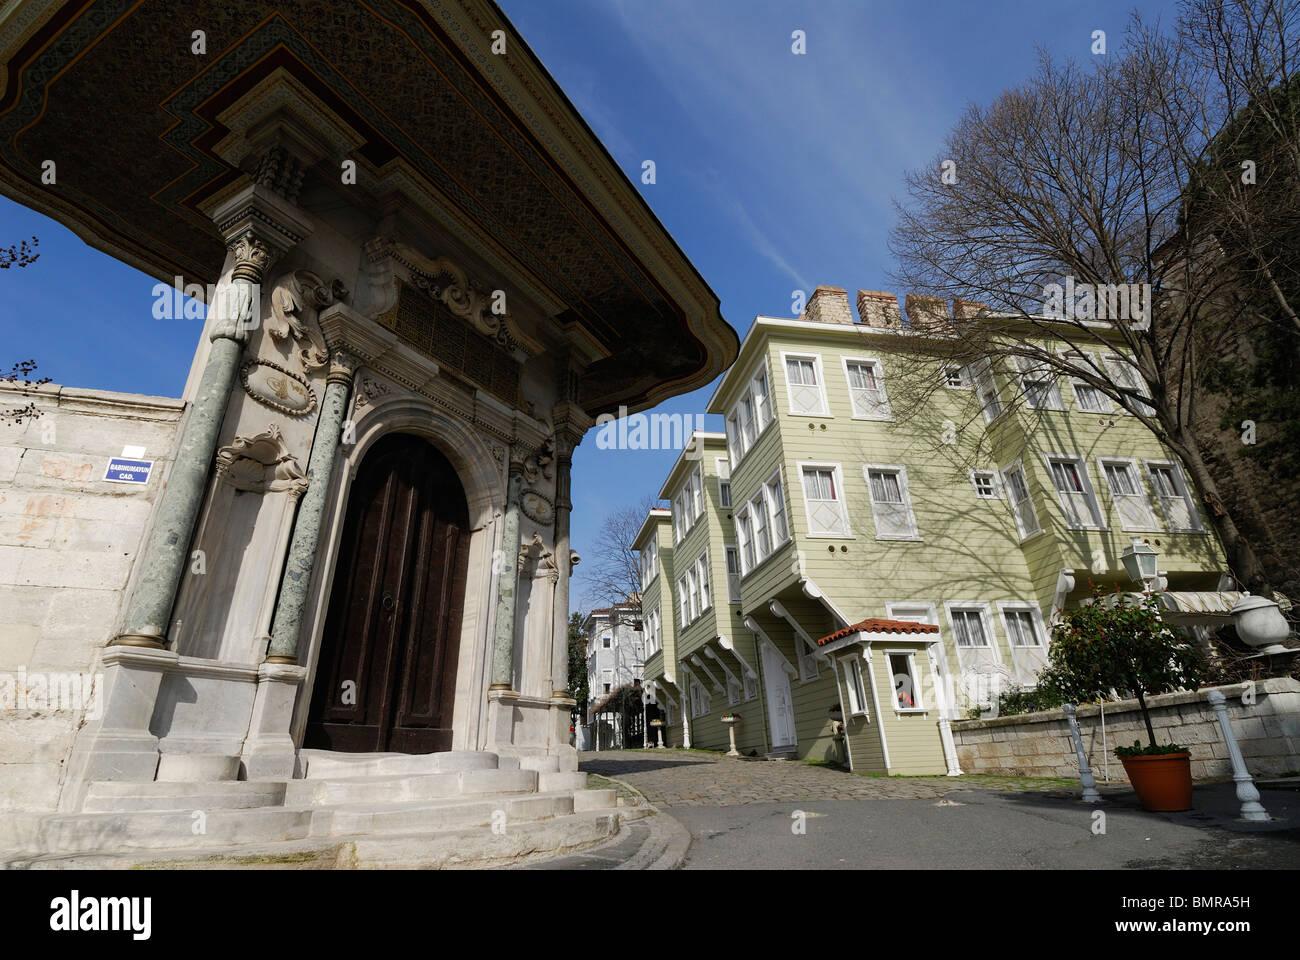 Istanbul. Turkey. Traditional Wooden houses on Sogukcesme Sok, Sultanahmet & the east gate of Haghia Sophia - Stock Image